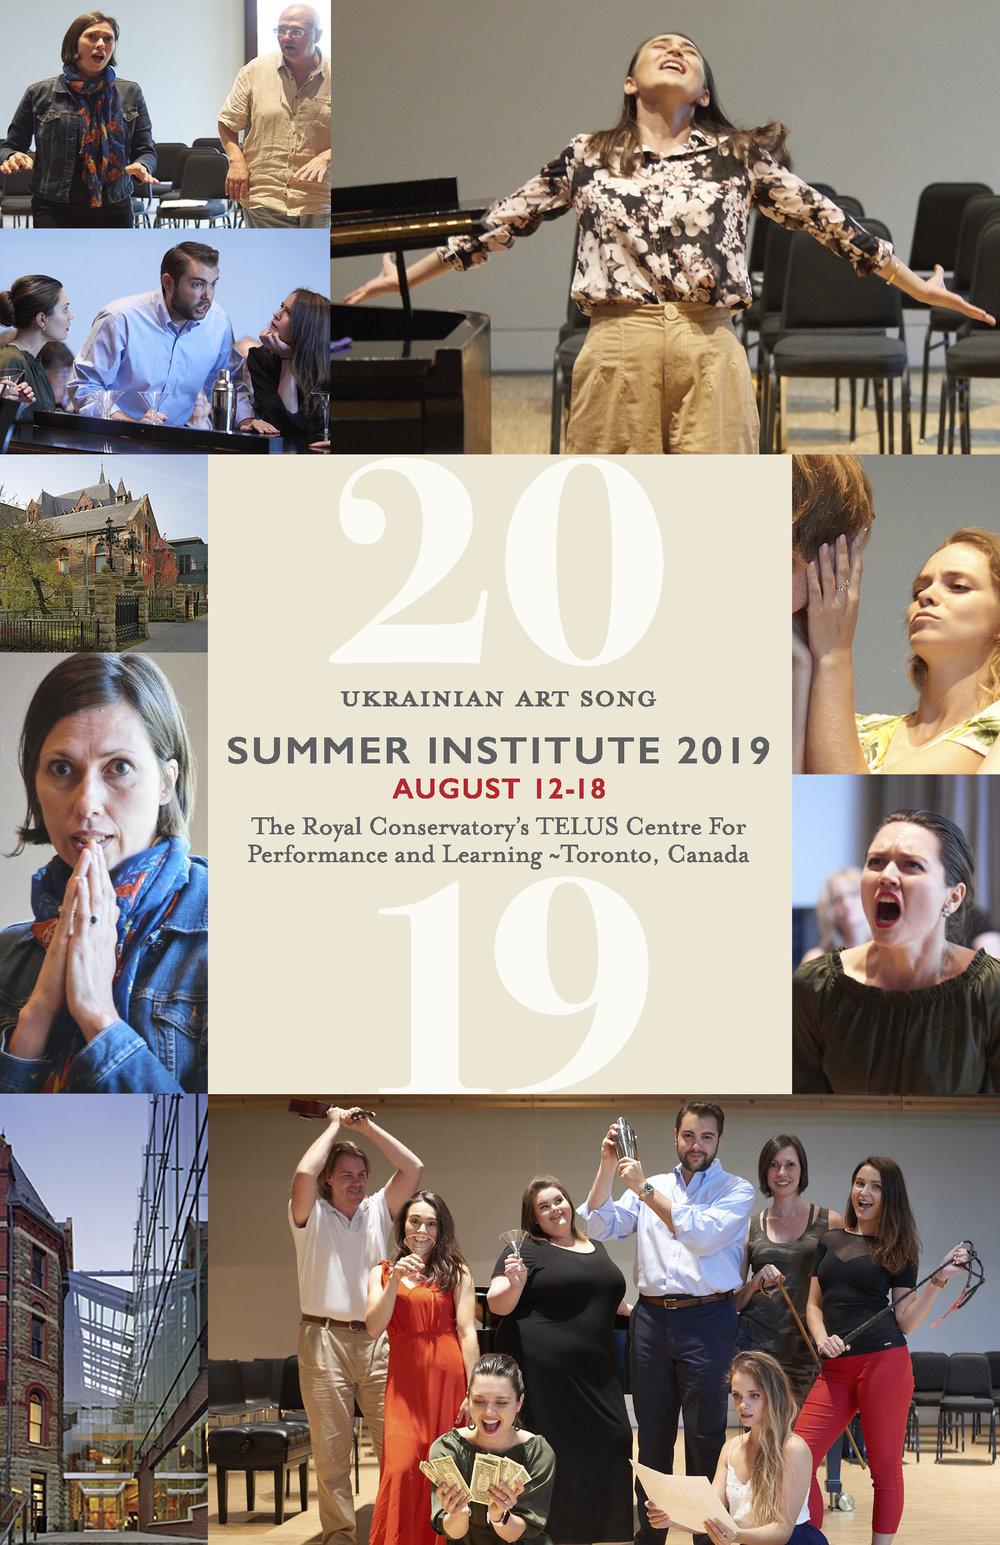 Summer Institute 2019 postcard FINAL 2.jpg